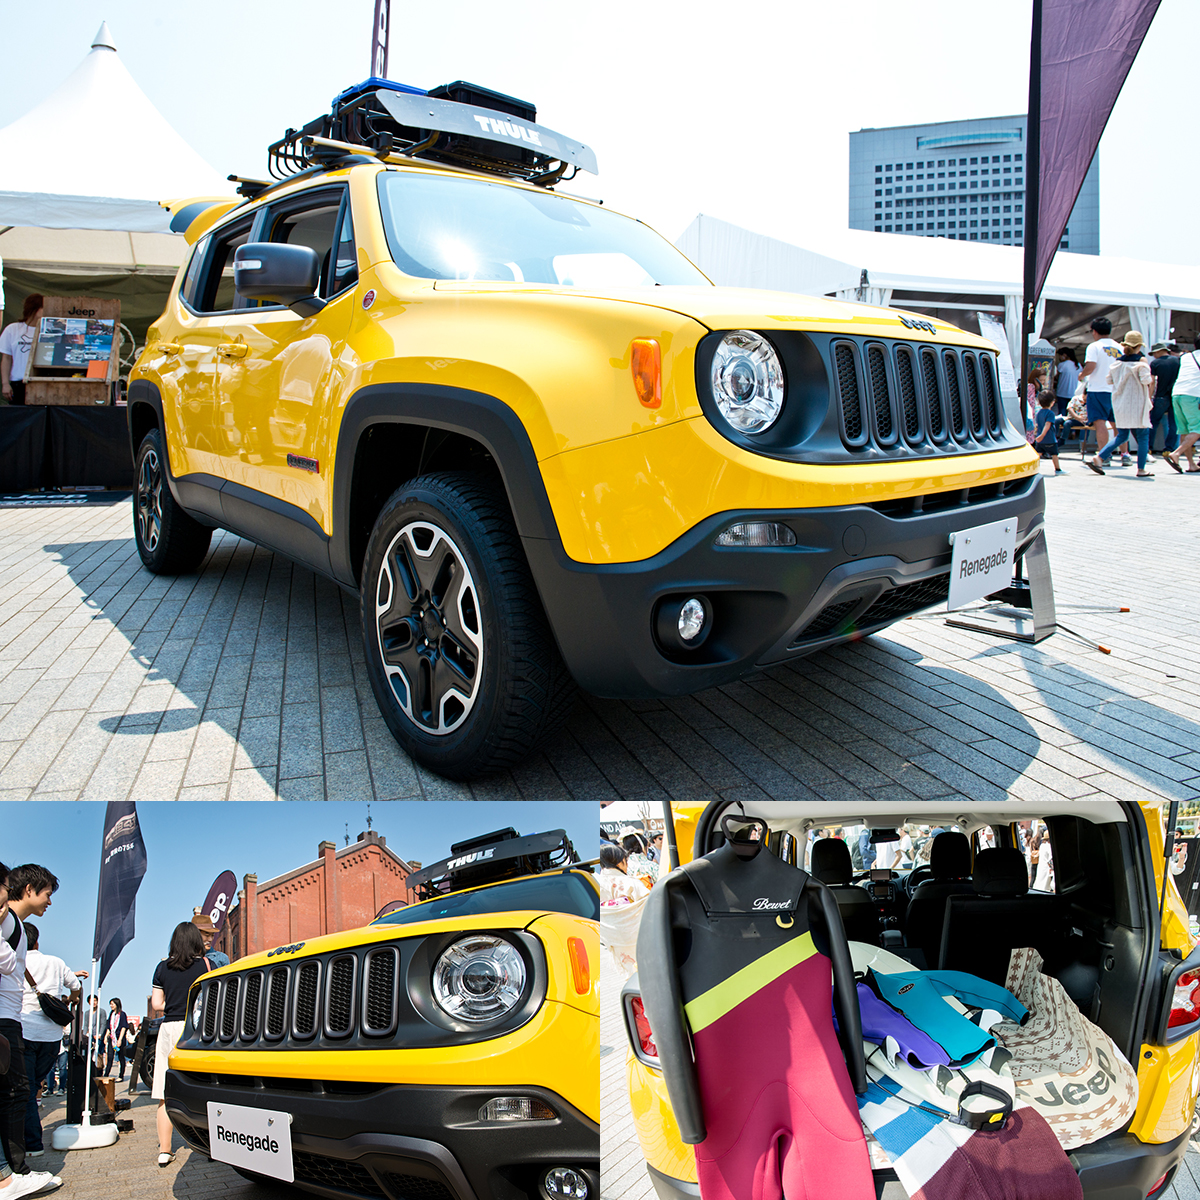 20160521_Jeep-0014 <GREENROOM FESTIVAL'16>フェスファッションスナップを公開!Jeep®ブースの模様もレポート!